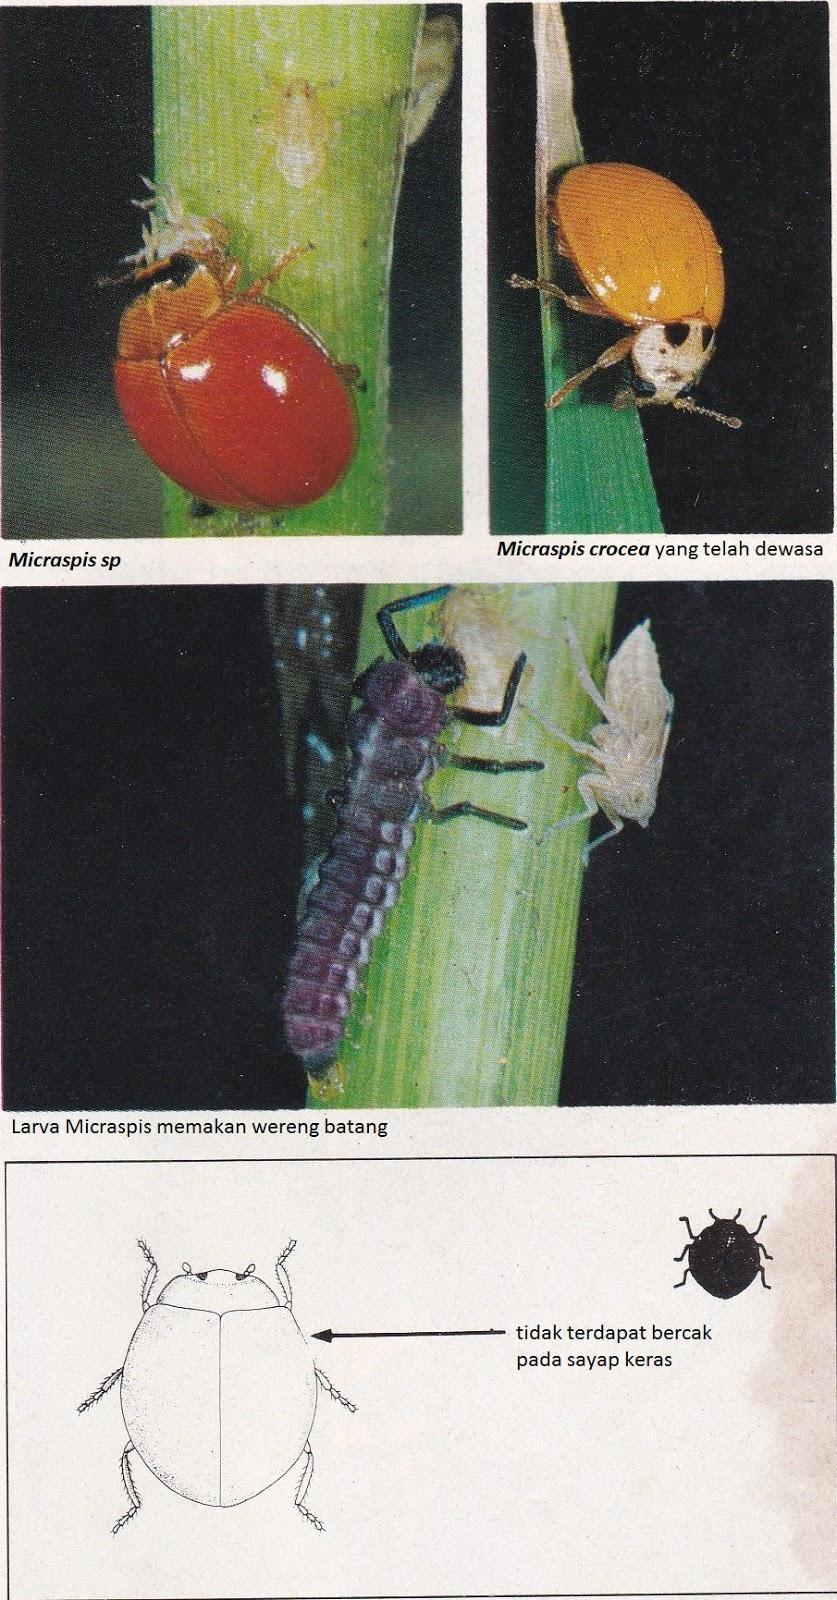 Berbagai Jenis Serangga Sebagai Musuh Alami Hama Tanaman Padi Pemuda Tani